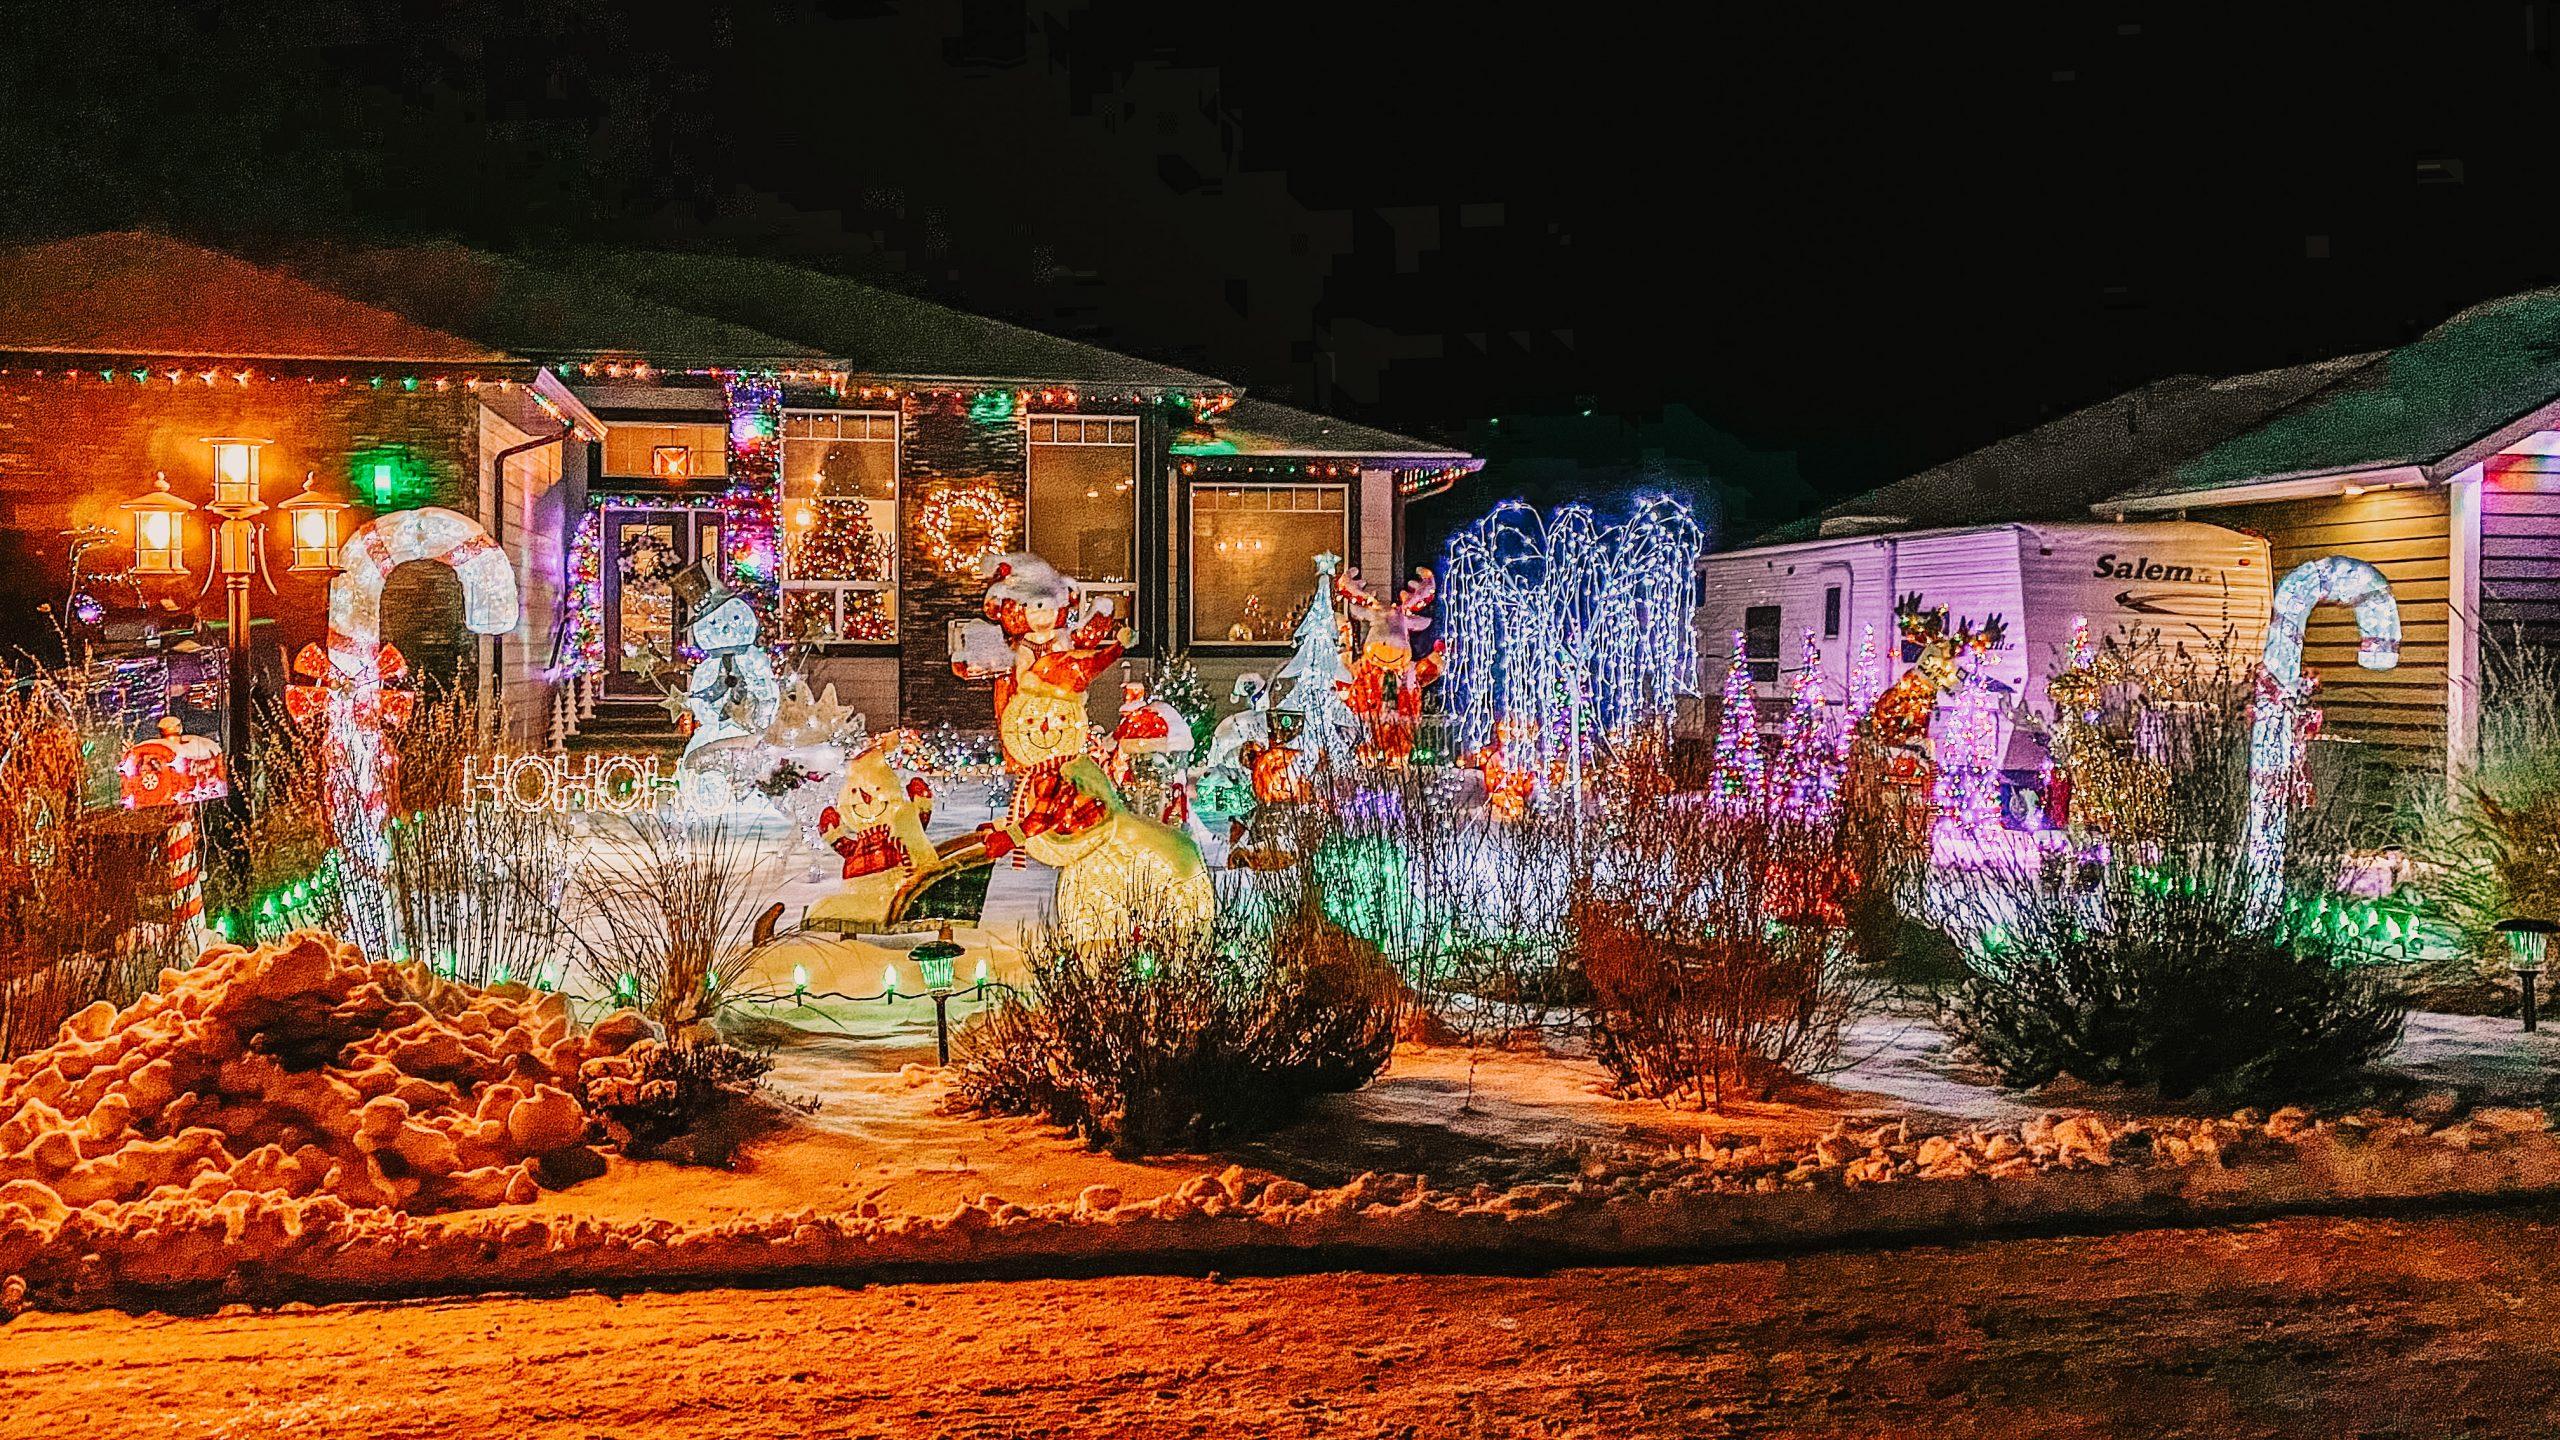 Festive Christmas Lights of Kamloops, BC